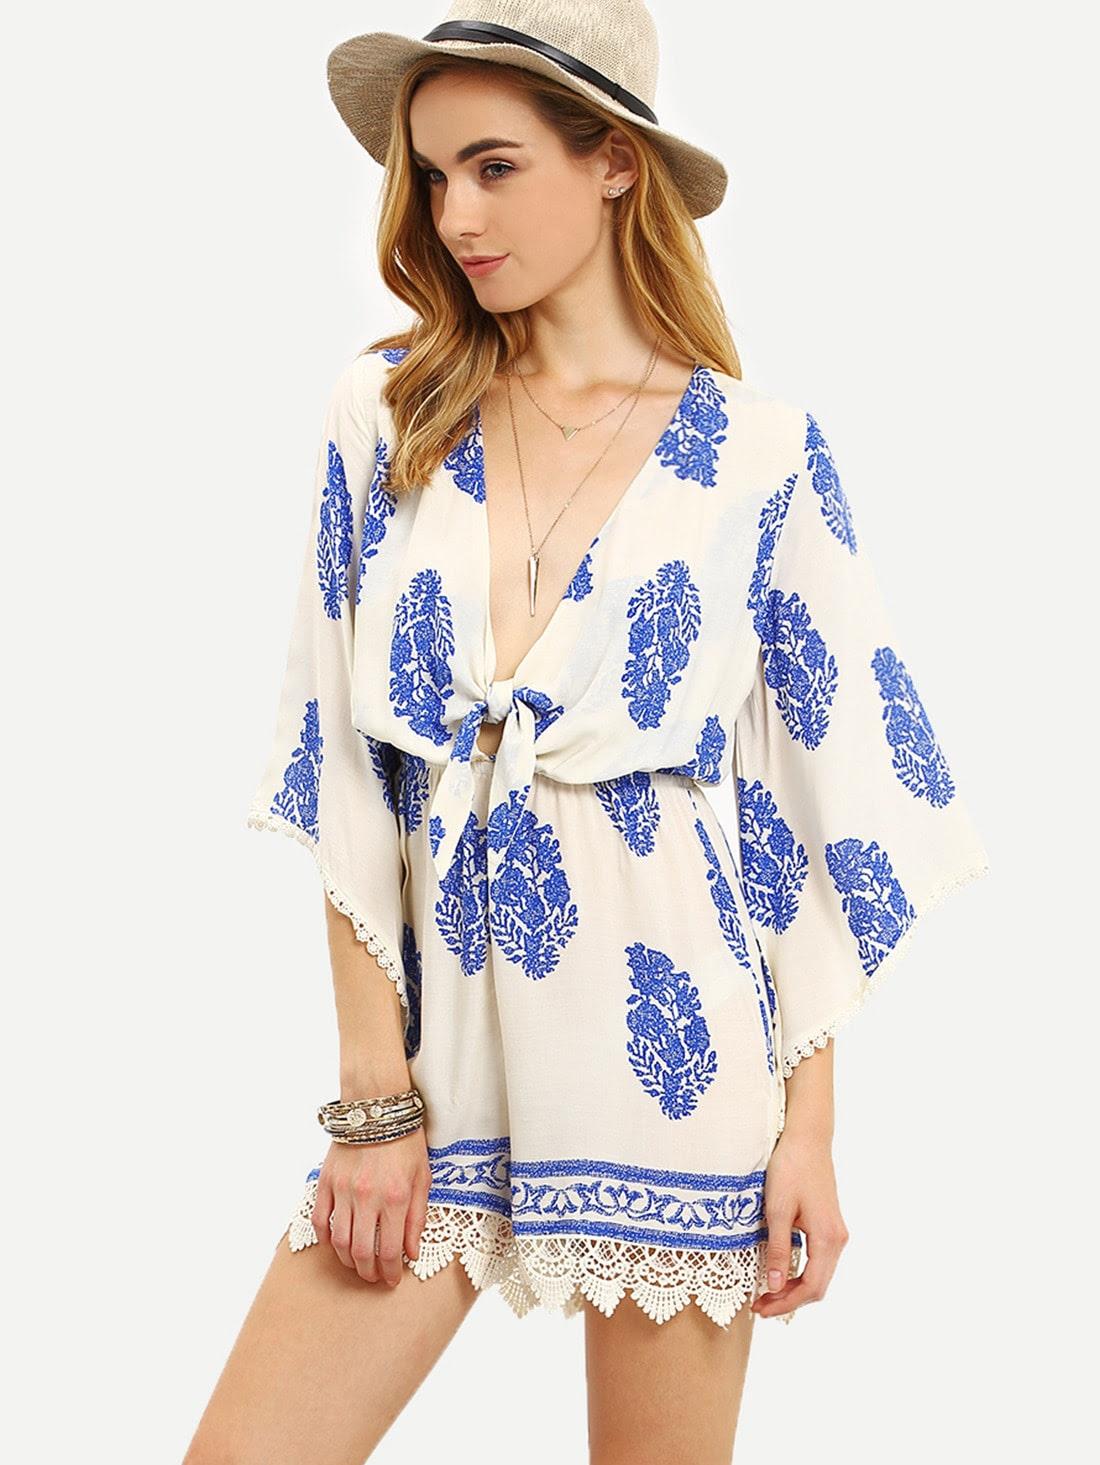 Denim department stores Short Sleeve Band Waist Pleated Dress drop off